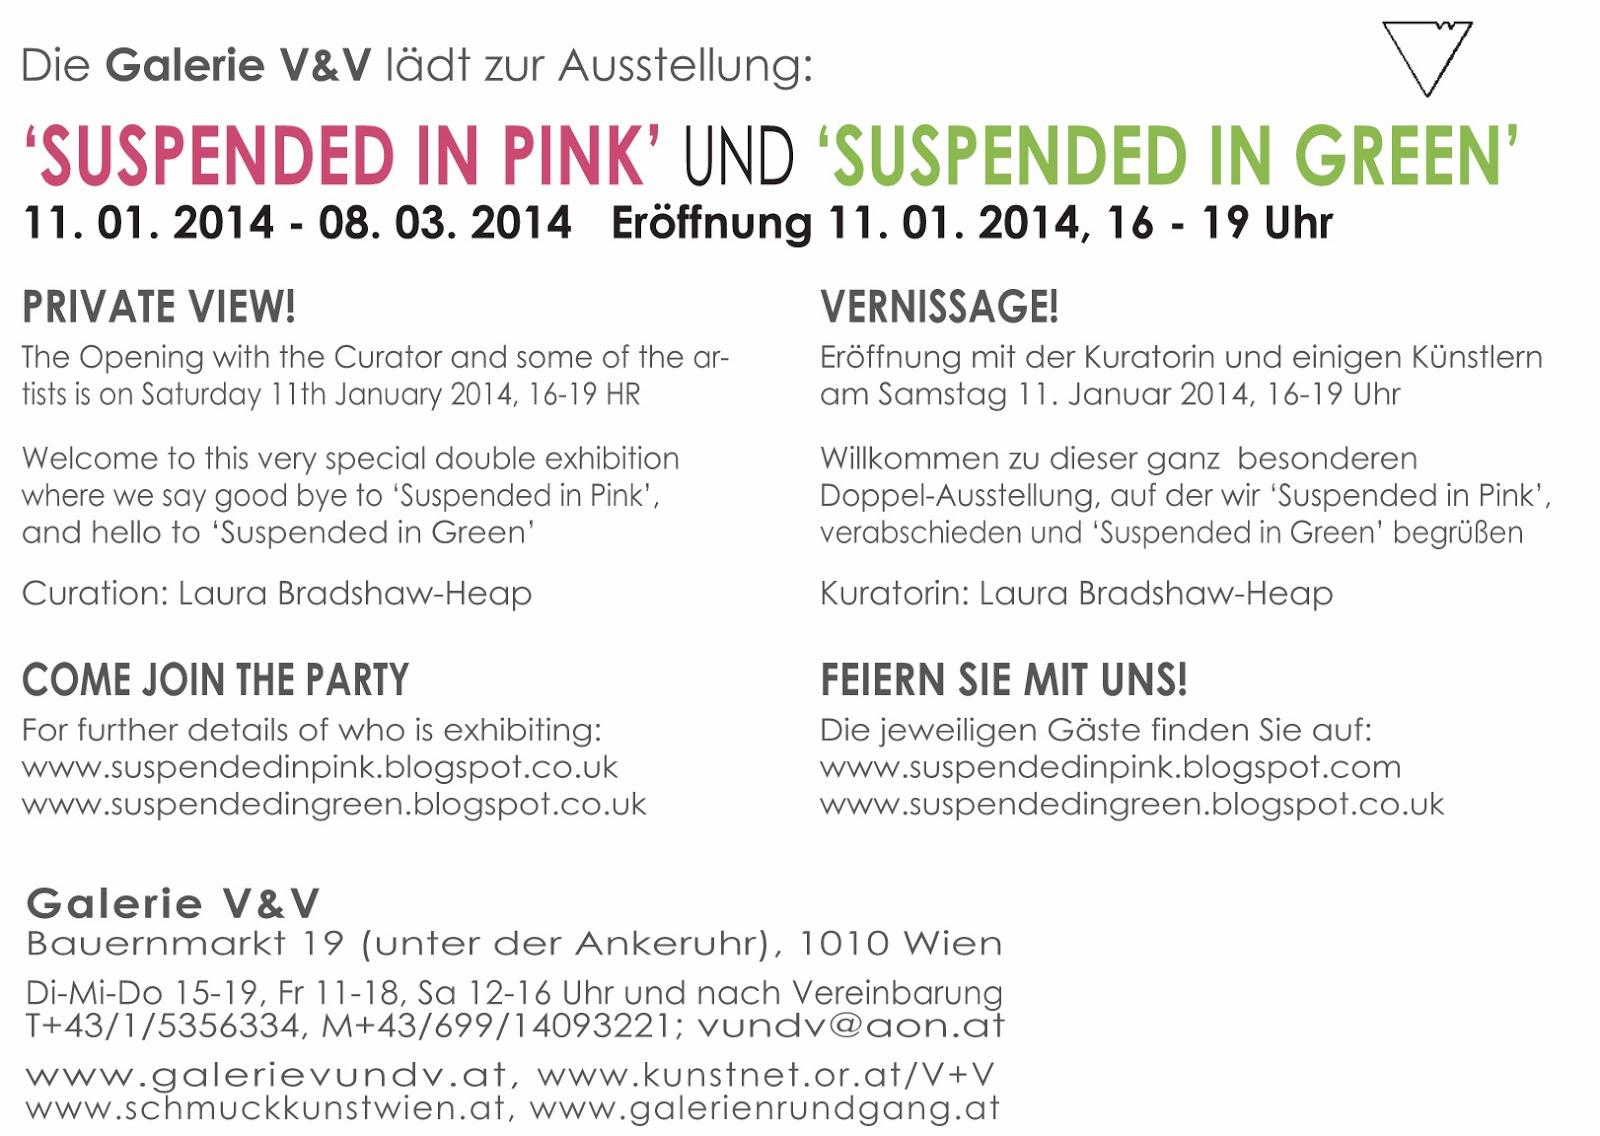 EXPO 'Suspended in GREEN' - V&V Gallery, Vienna (AT) - 11 Janv. - 8 Mars 2014 dans Autriche (AT) V&V2